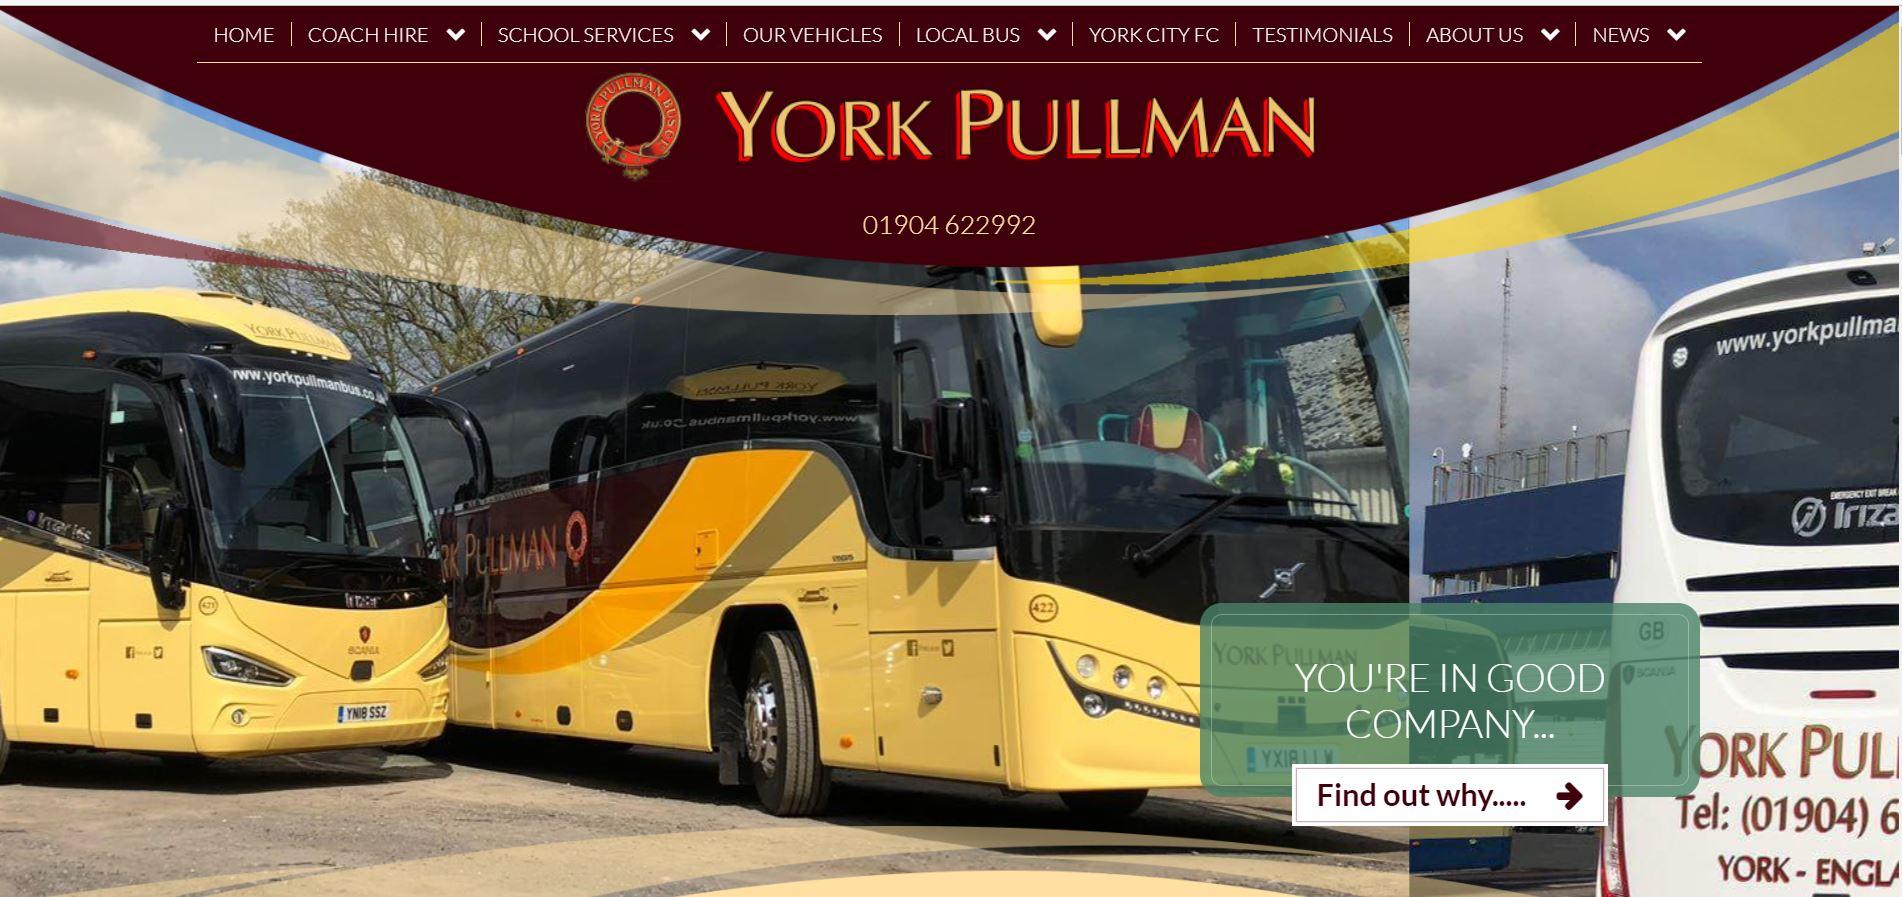 York Pullman bus